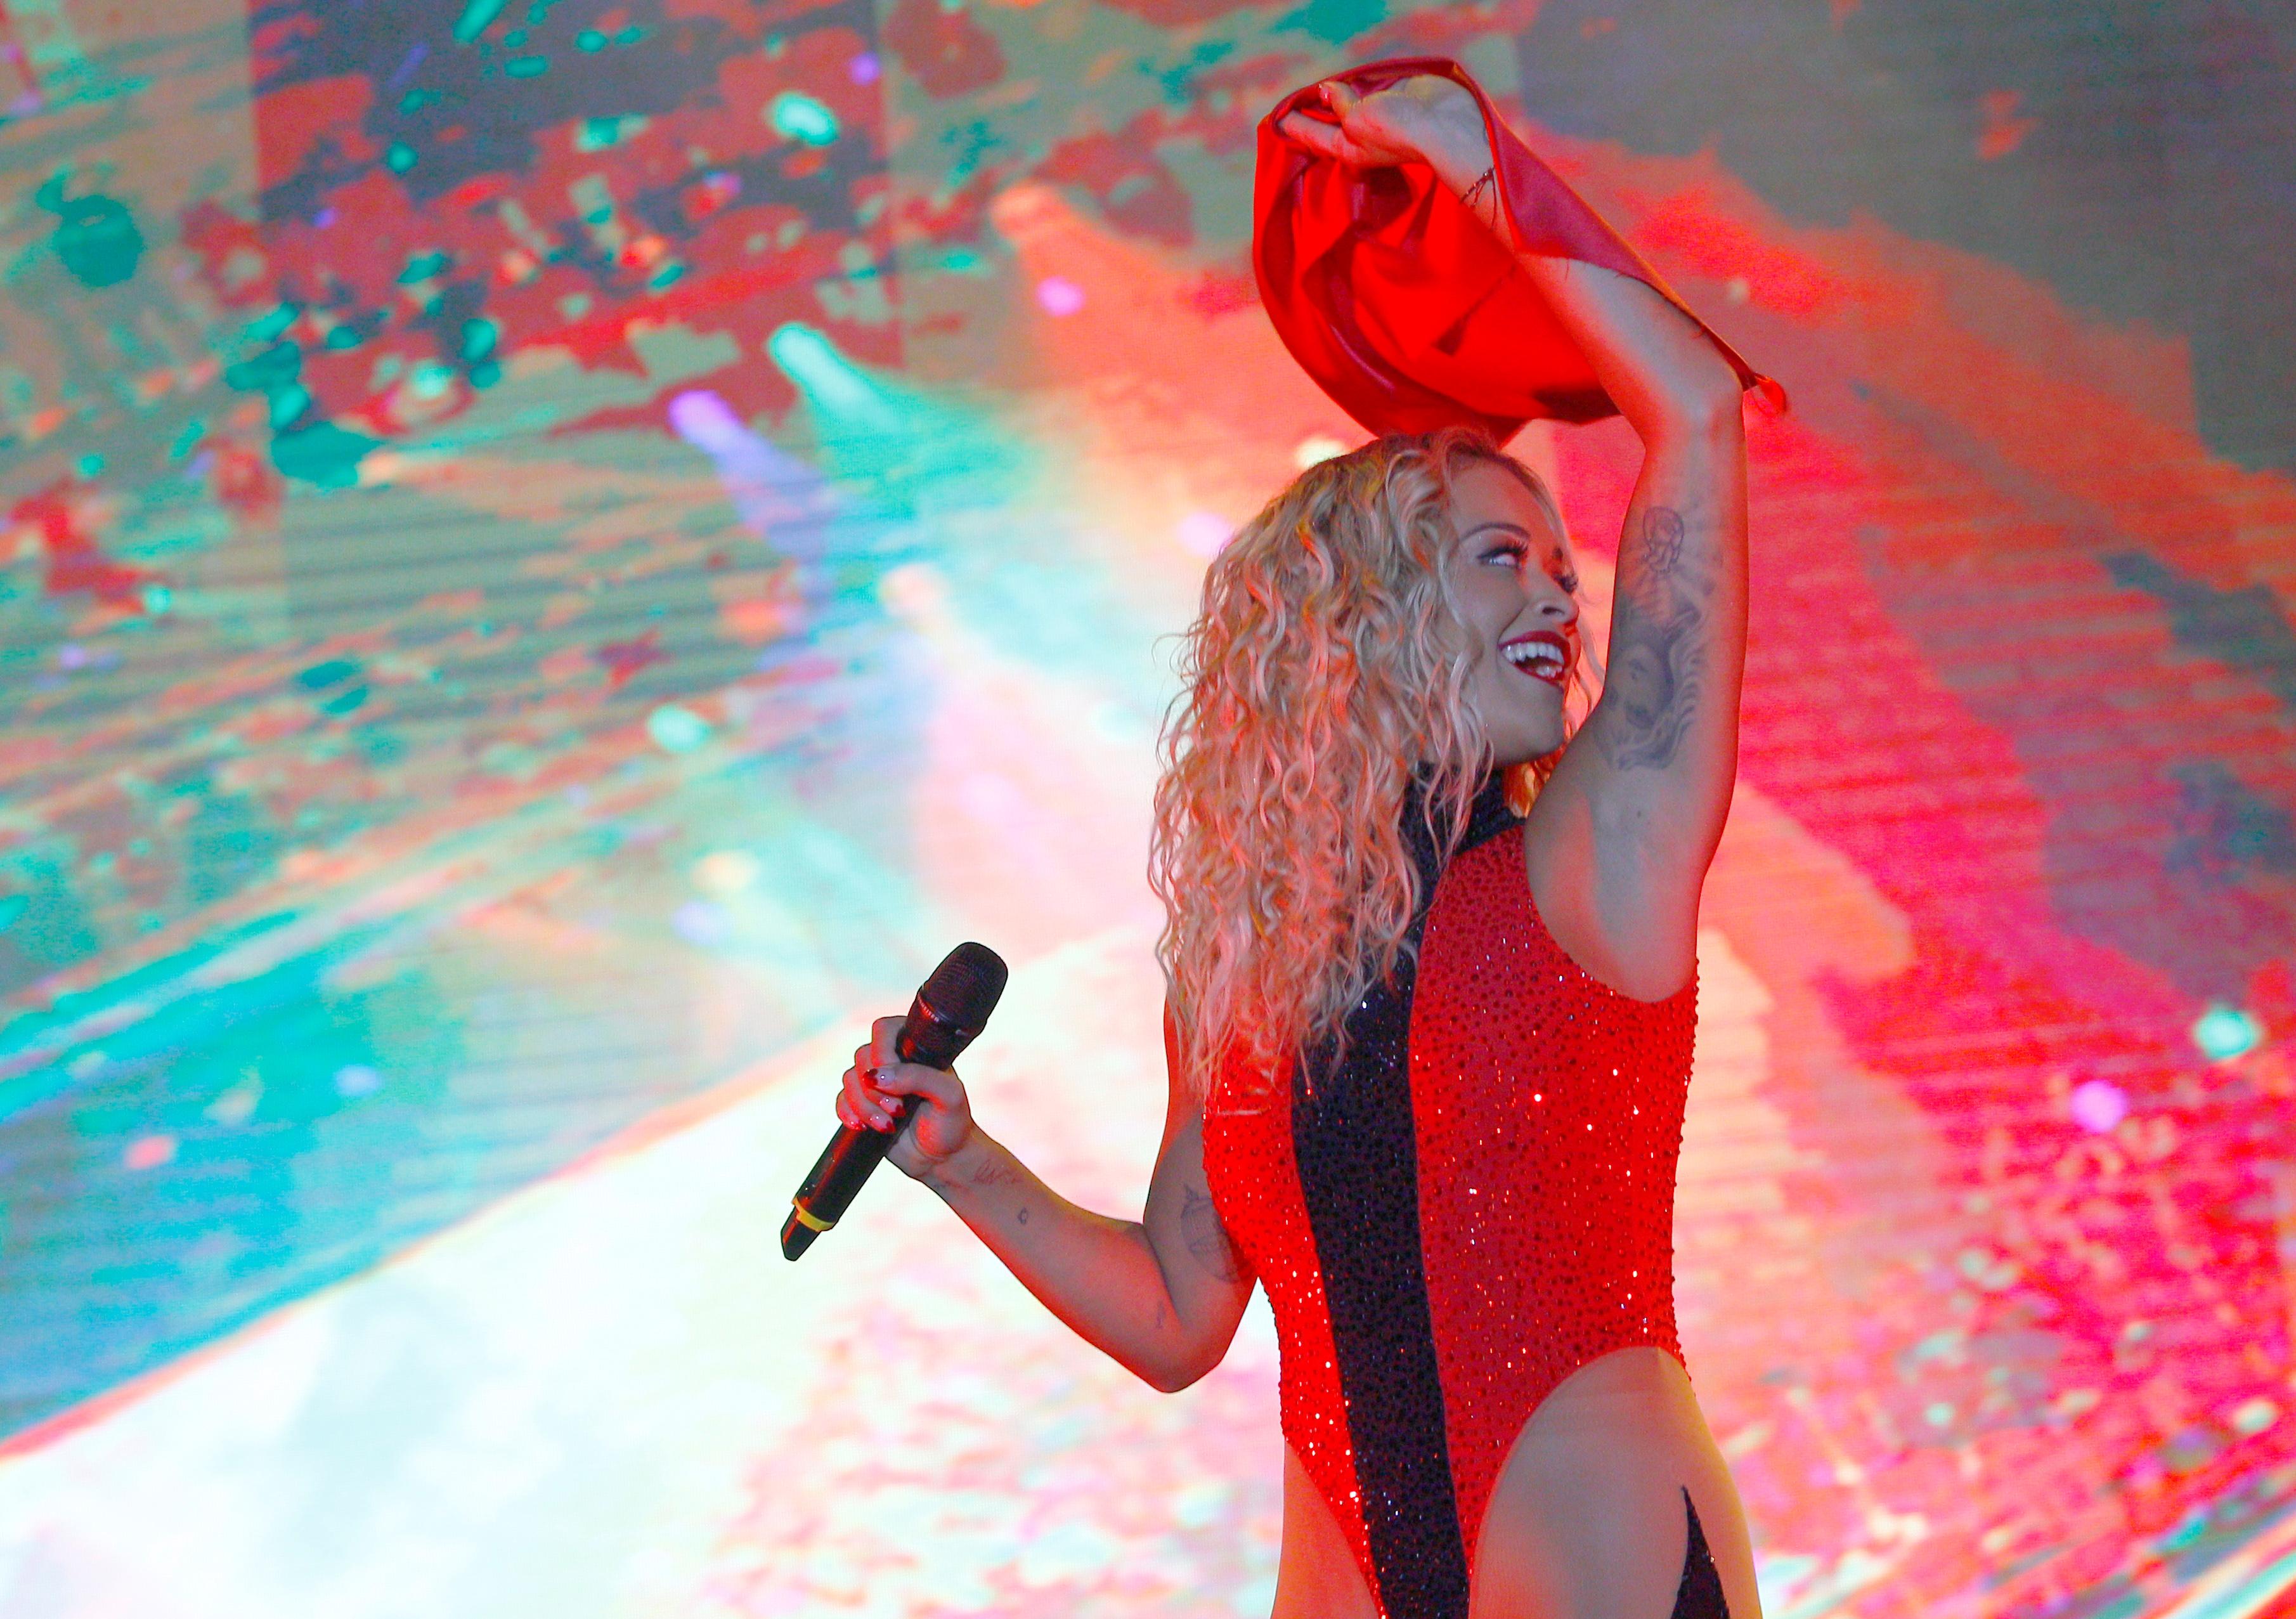 Singer Rita Ora preforms during celebration of the 10th anniversary of Kosovo's independence in Pristina, Kosovo February 17, 2018. REUTERS/Ognen Teofilovski - RC15B18ED7A0